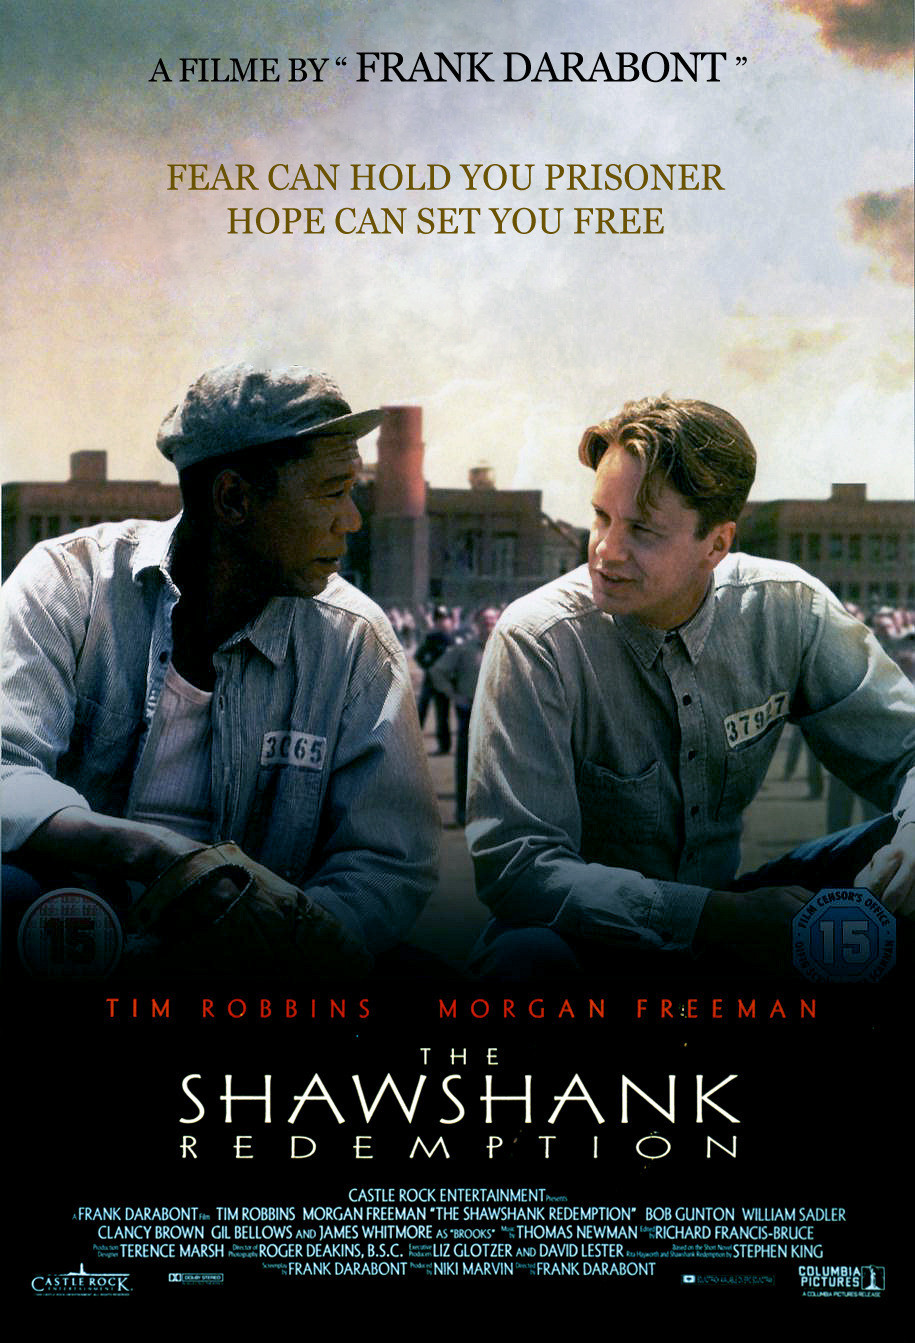 Watch the shawshank redemption online for free